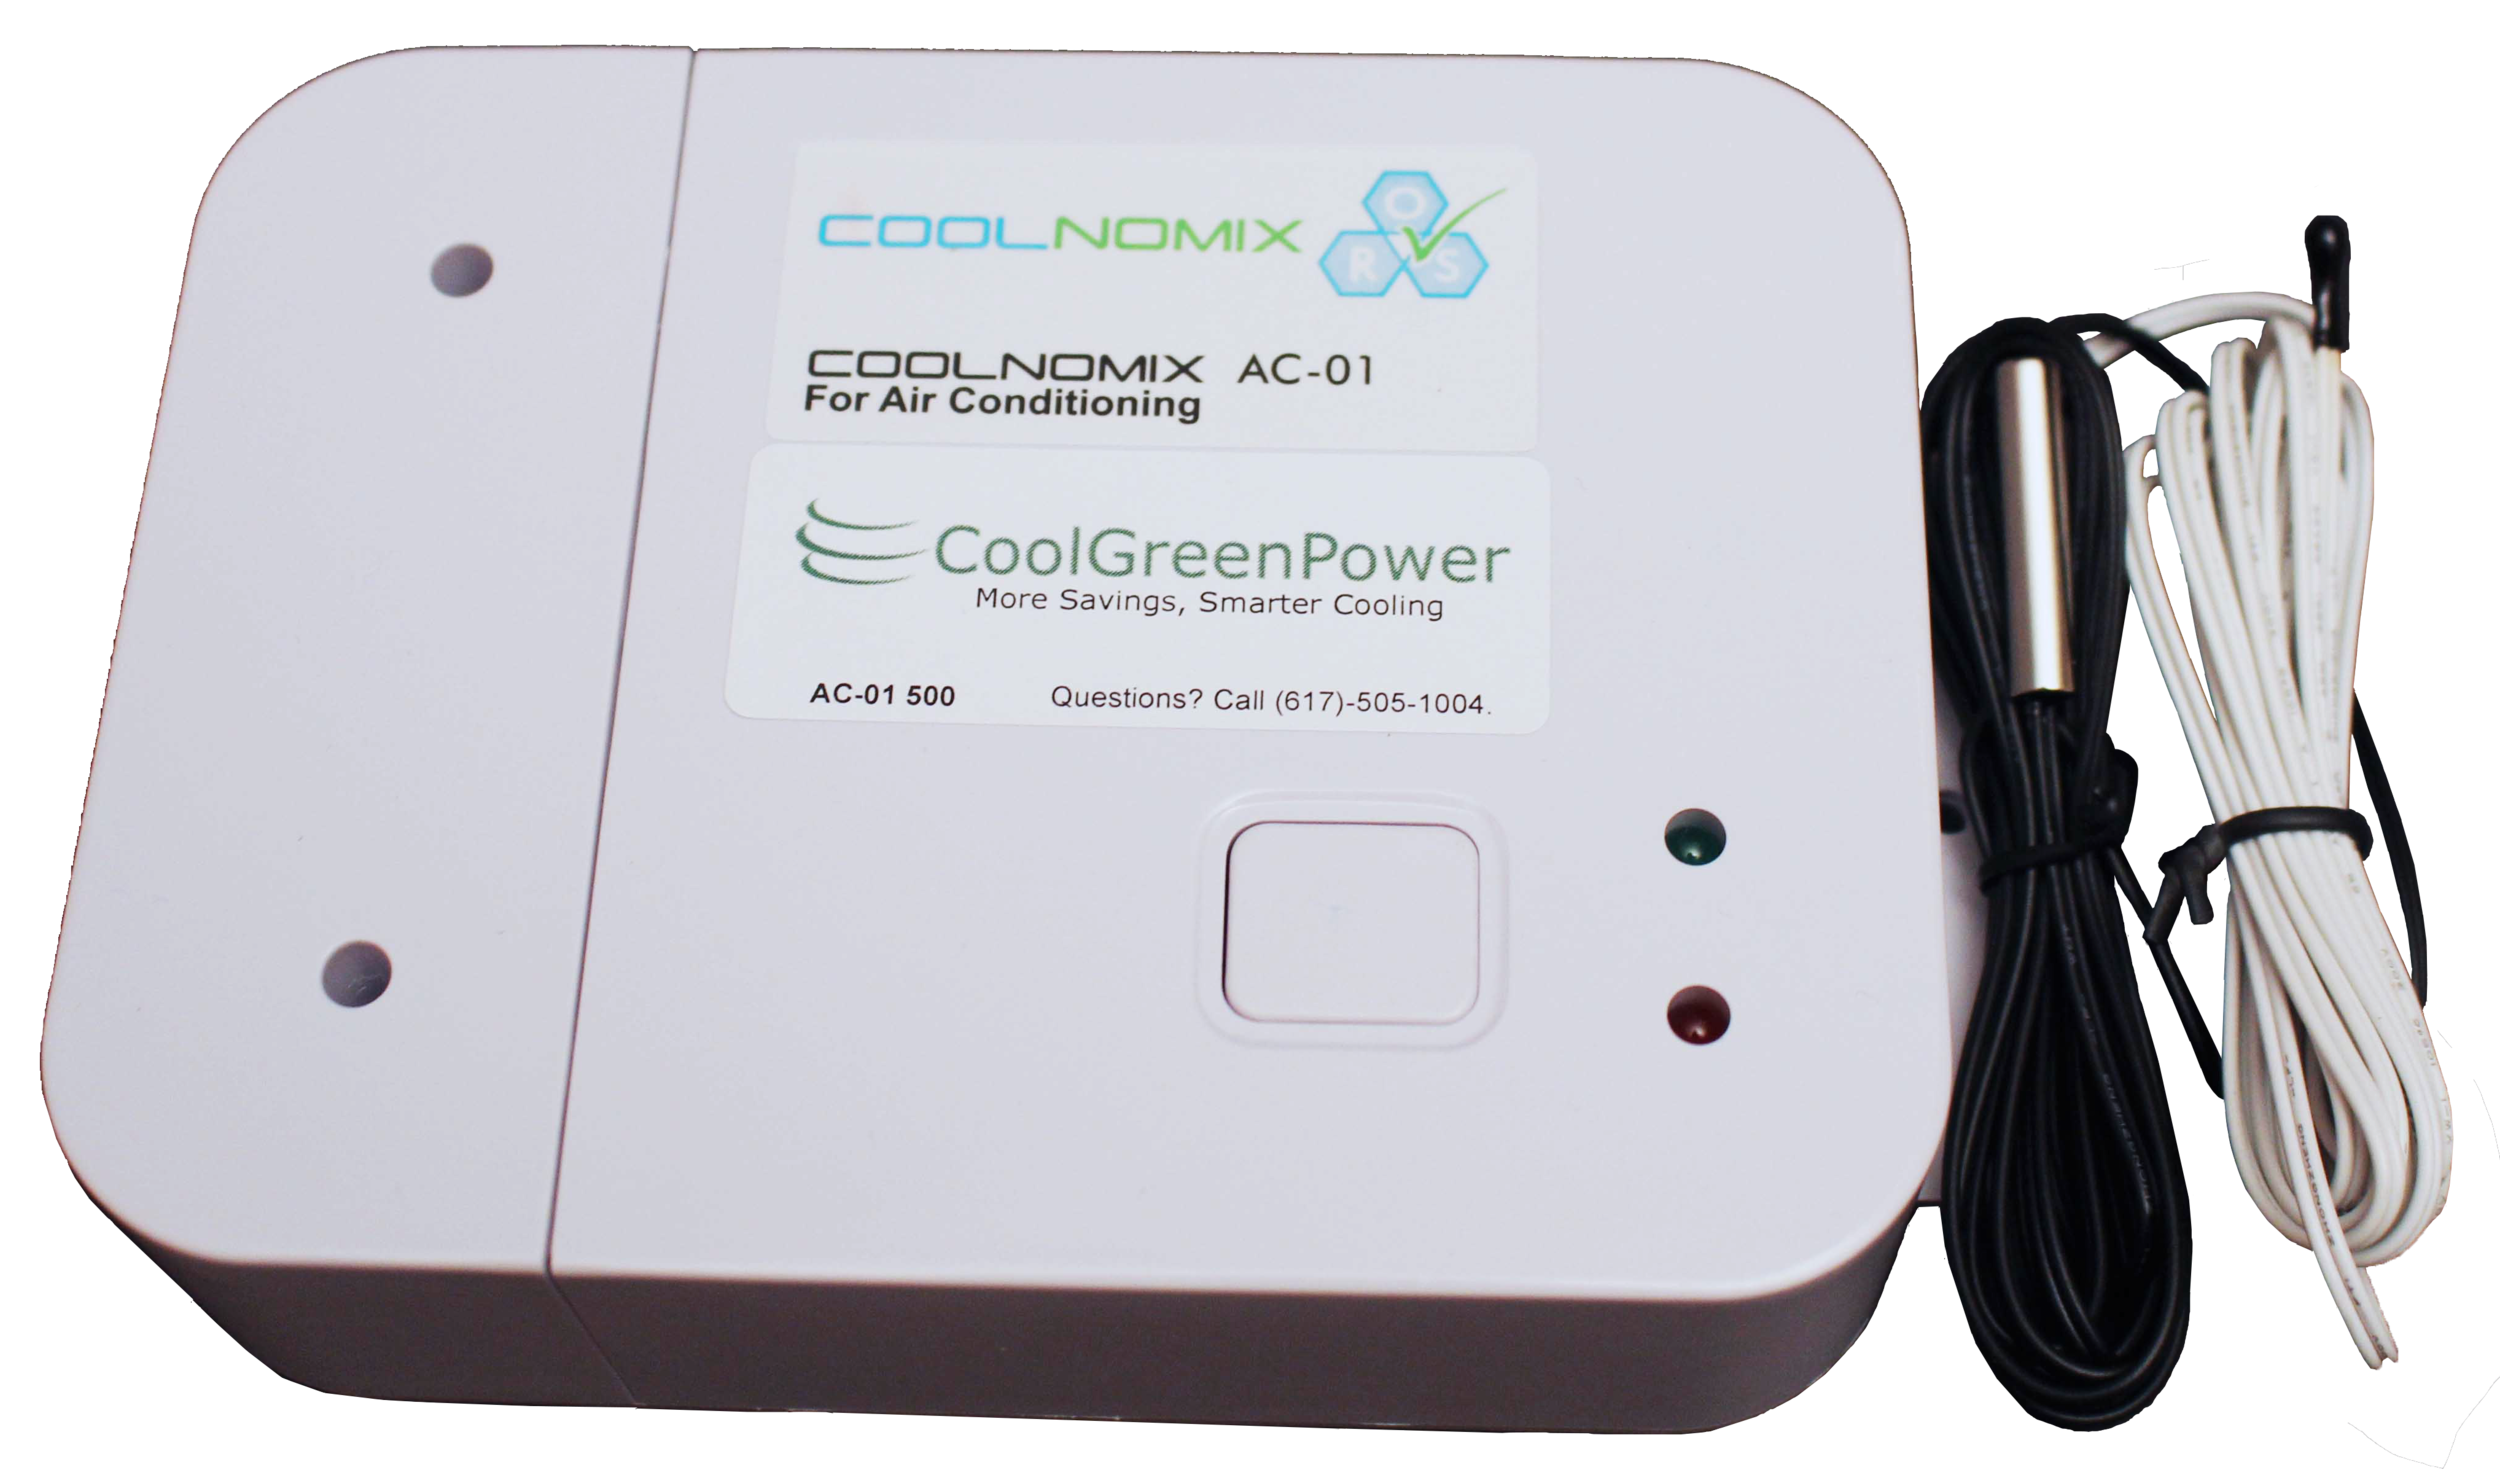 coolnomix-coolgreenpower